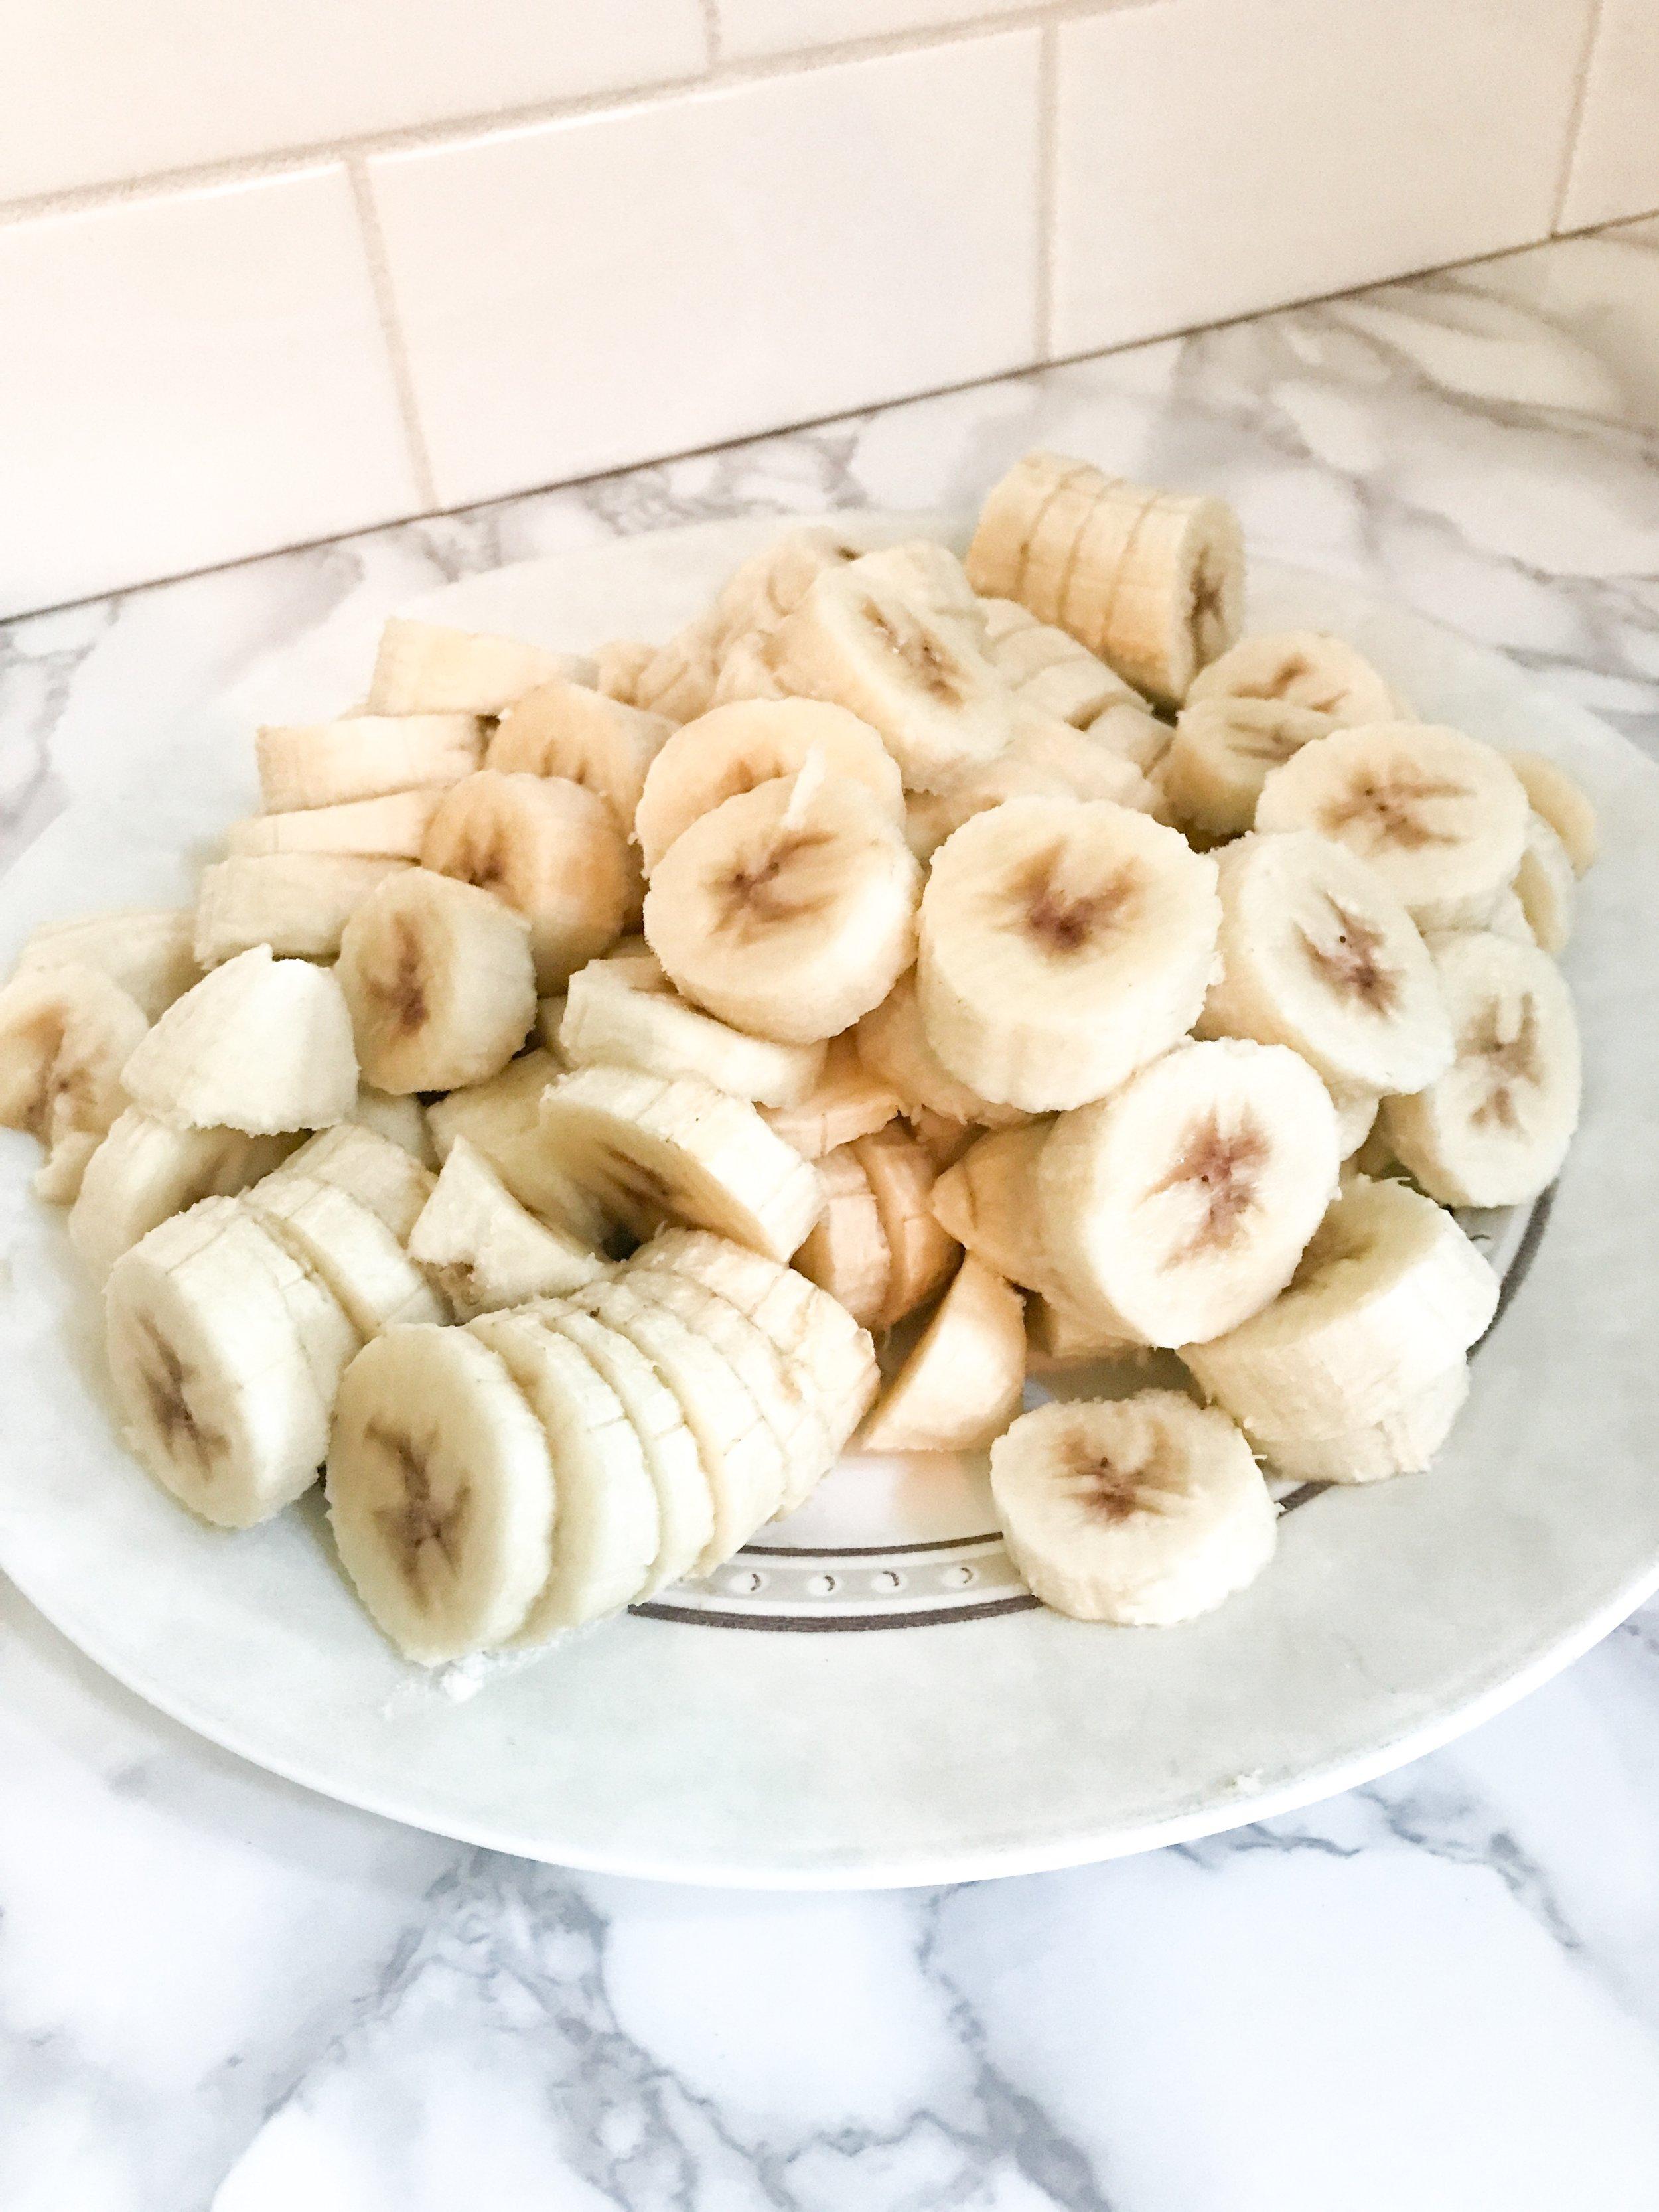 Pumpkin Spice Banana Soft Serve. Frozen banana soft serve ice cream recipe.